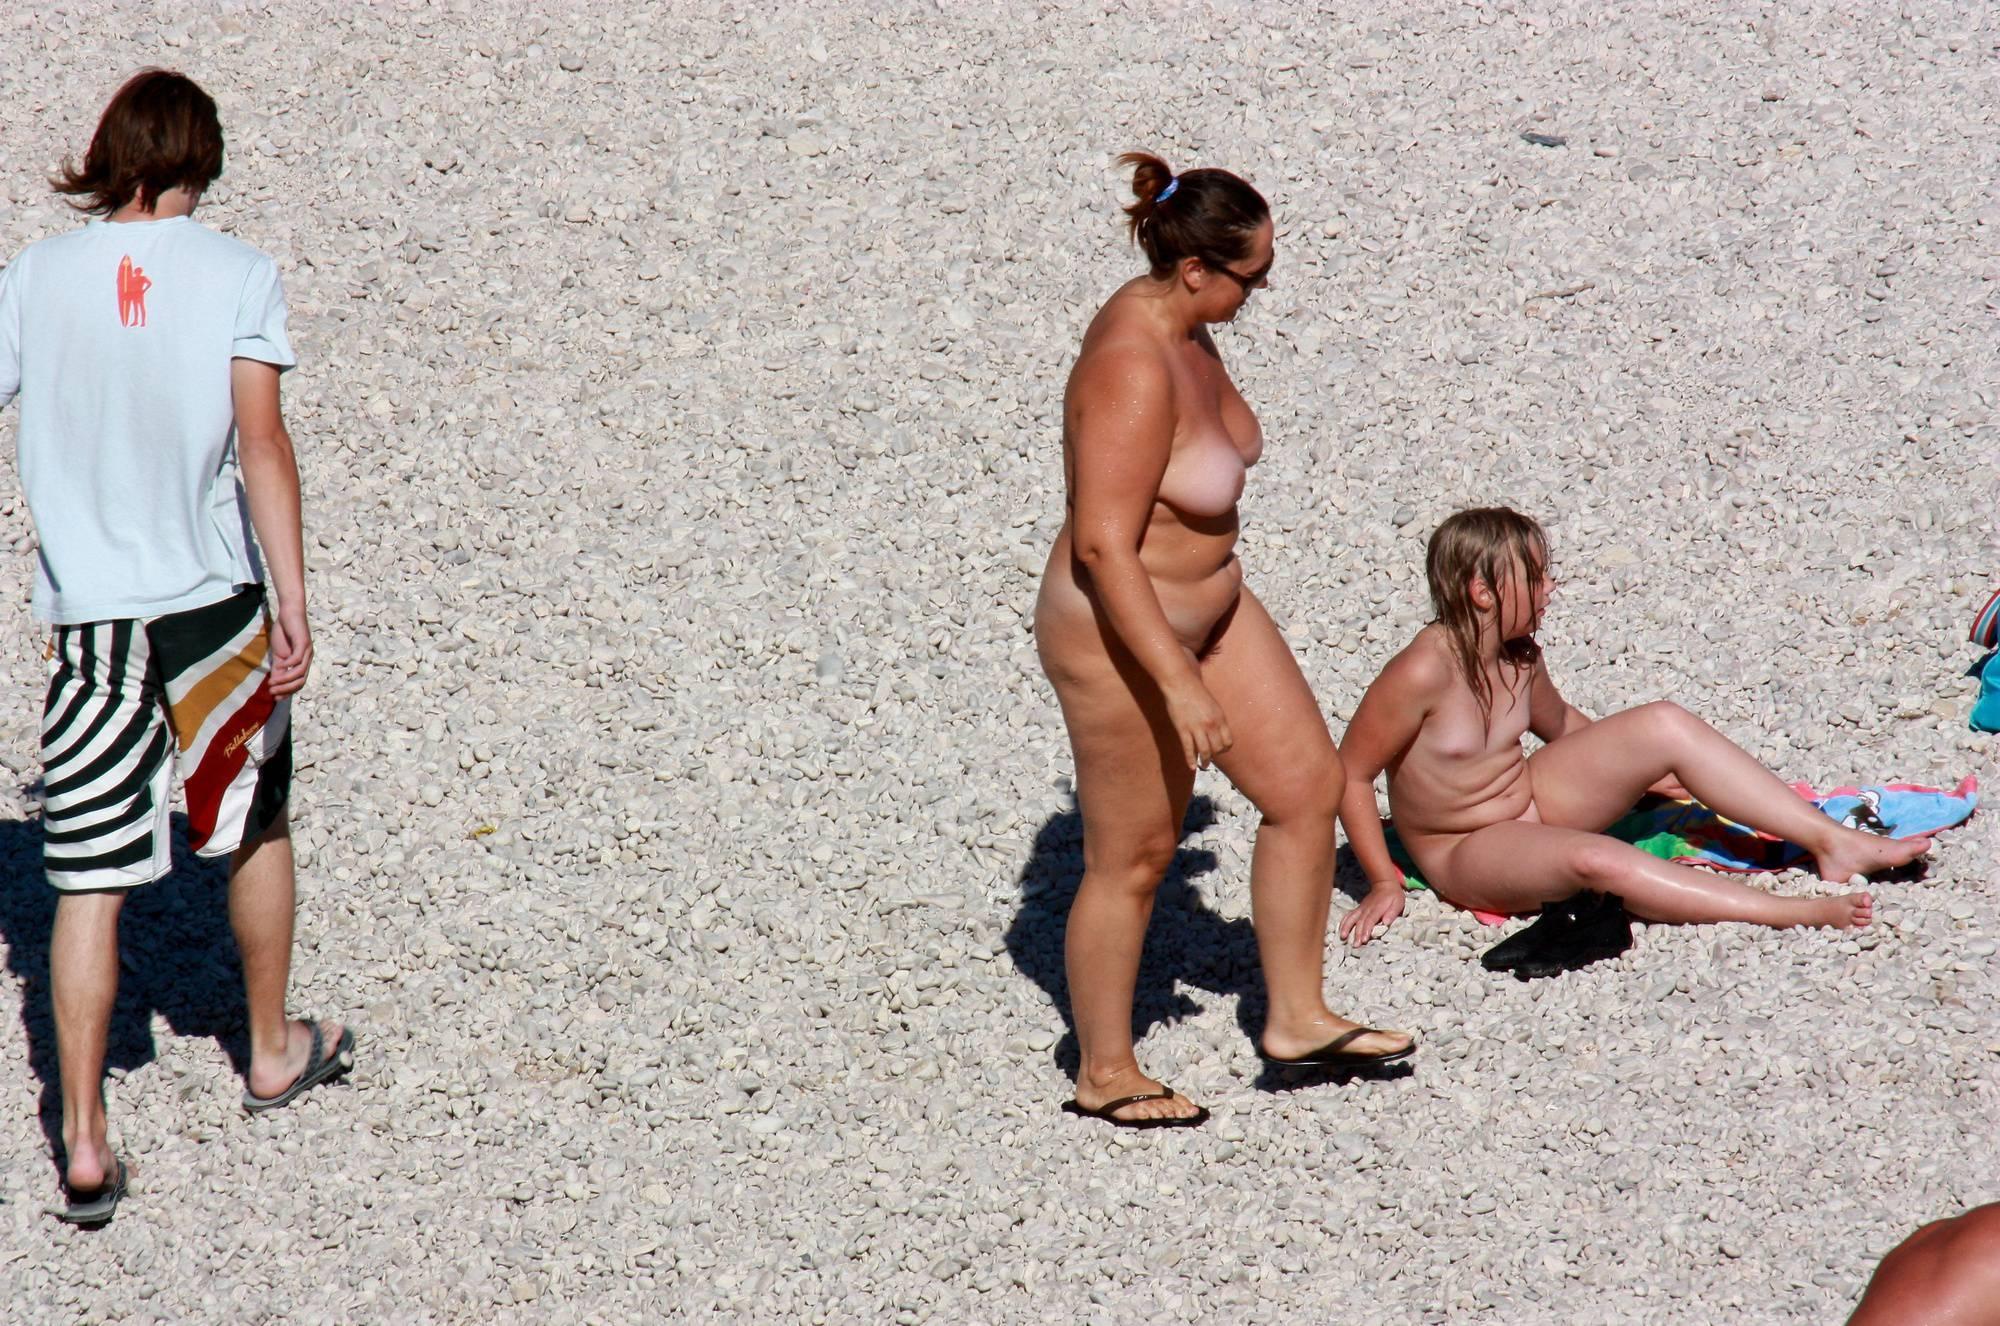 Nudist Pics Nudist Sands Towel Wrap - 1